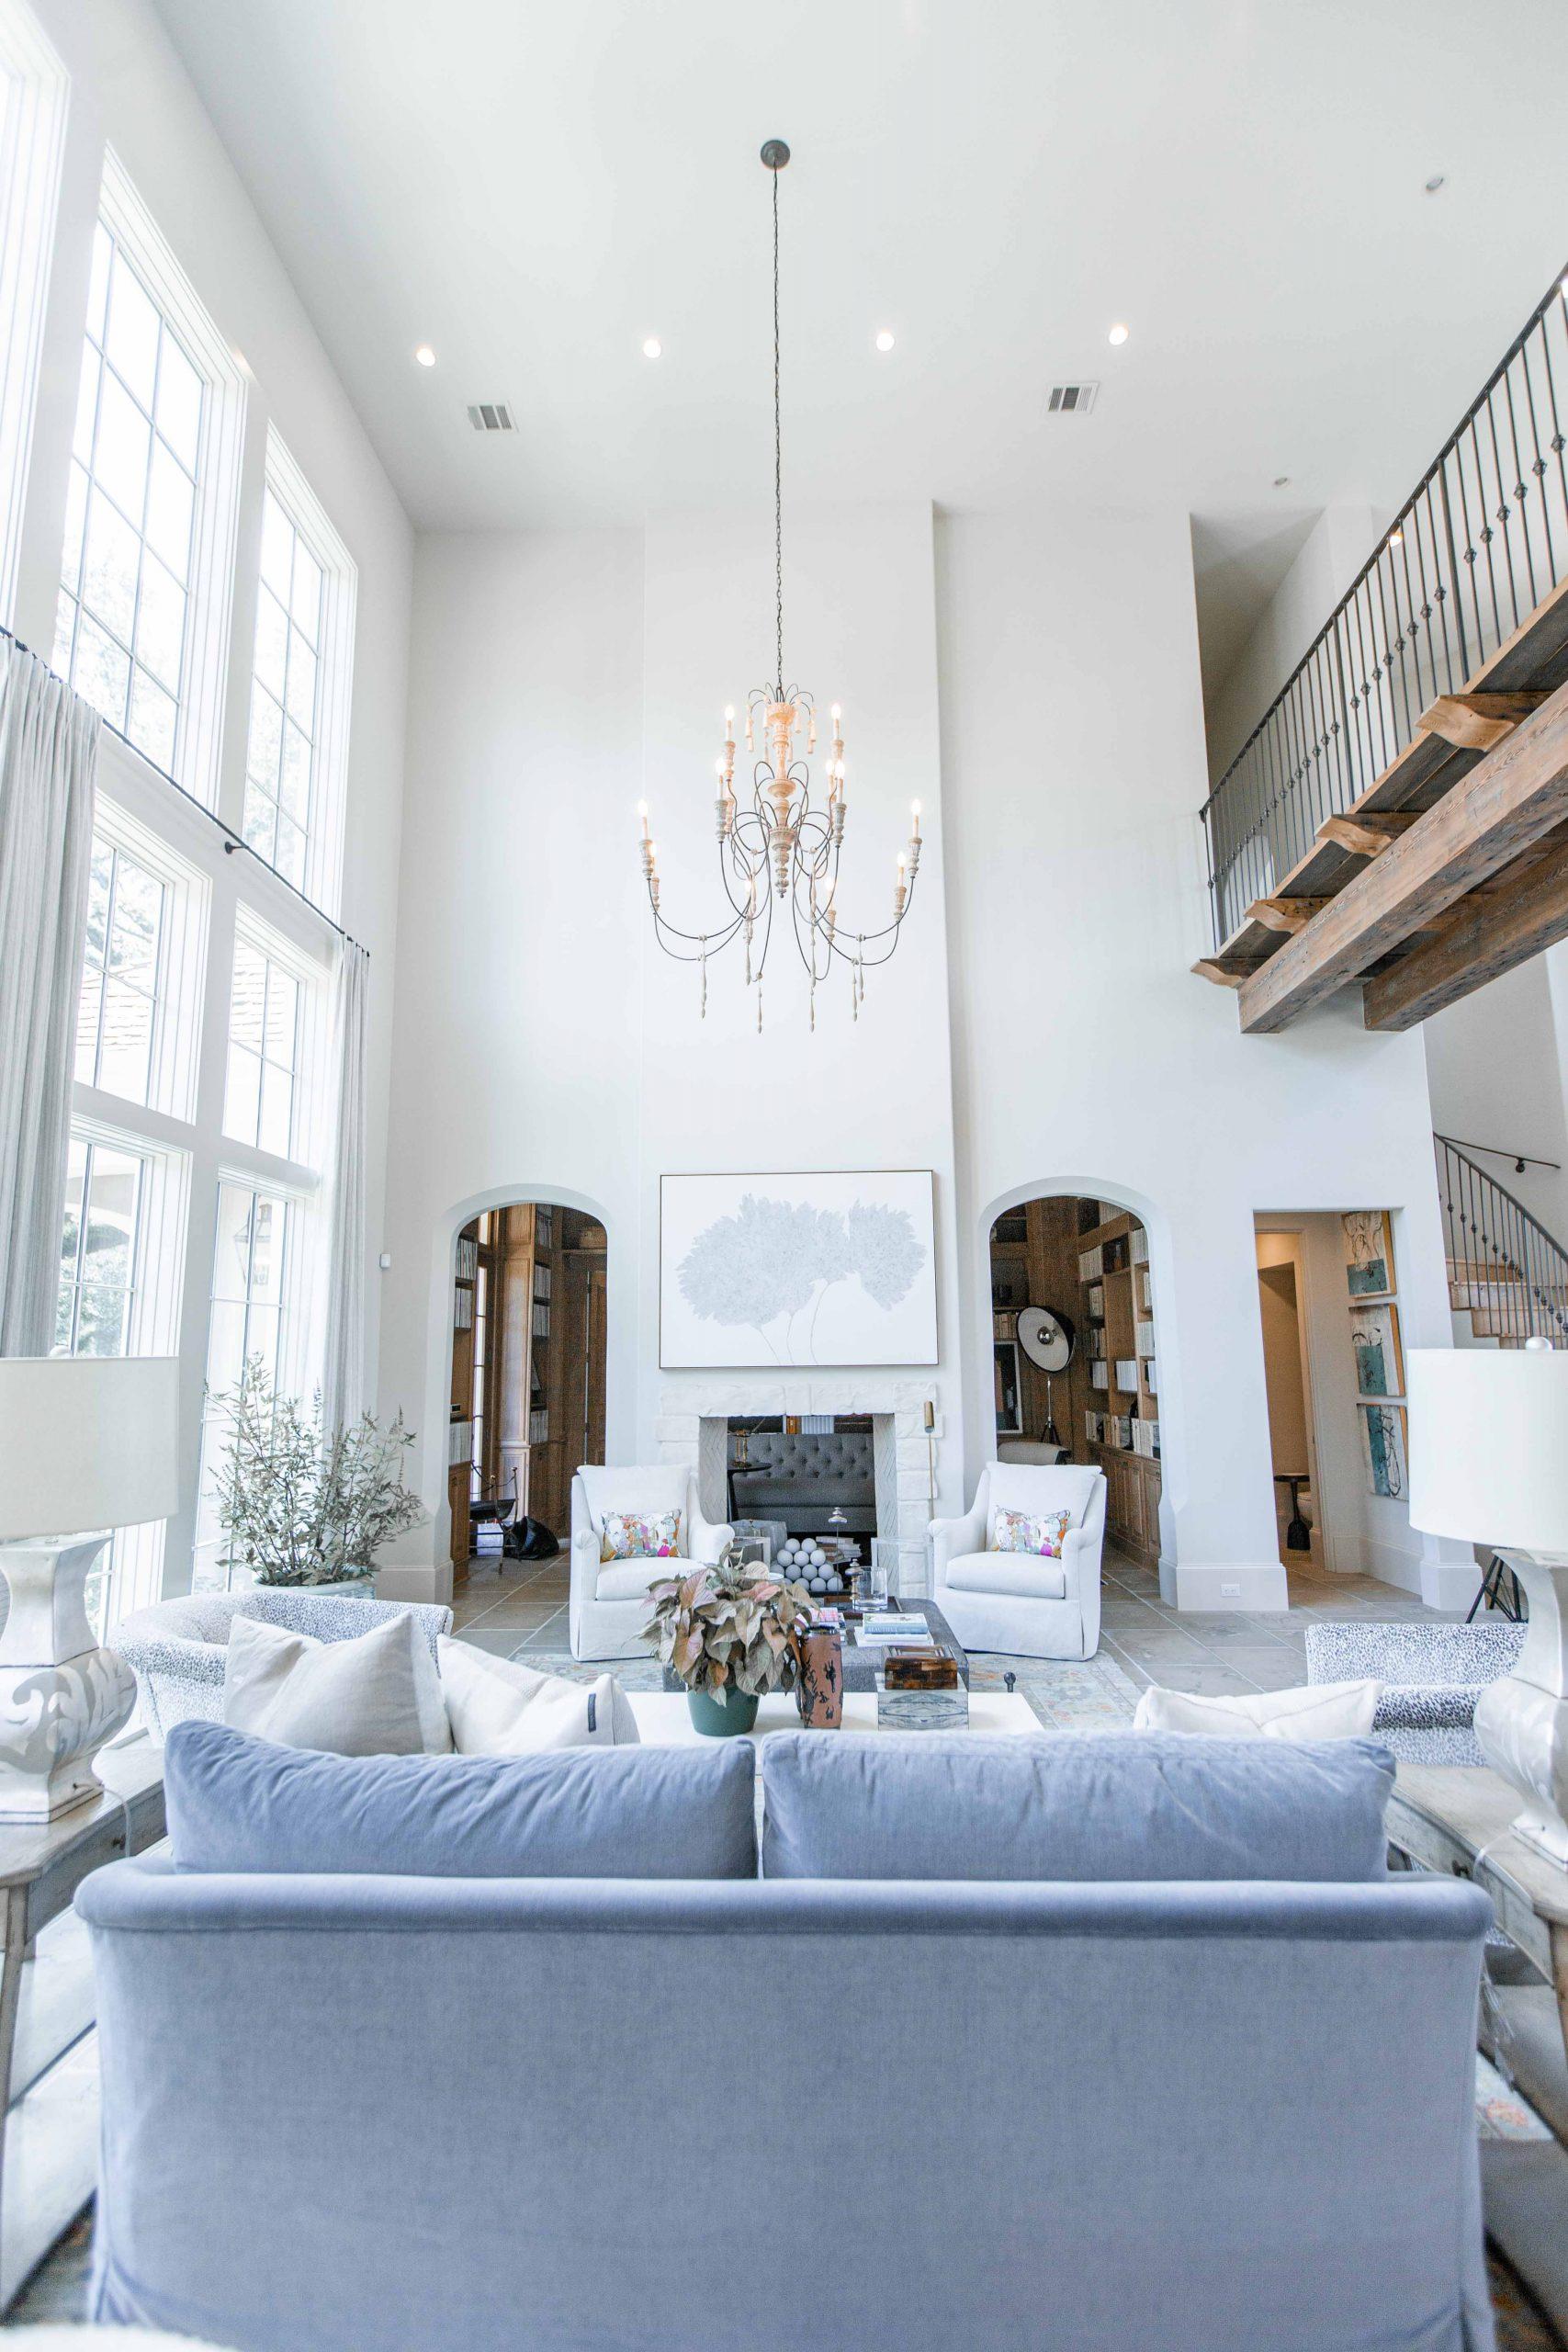 dixon-smith-interiors-baton-rouge-interior-design-custom-ivy-house-show-home-Web-0016